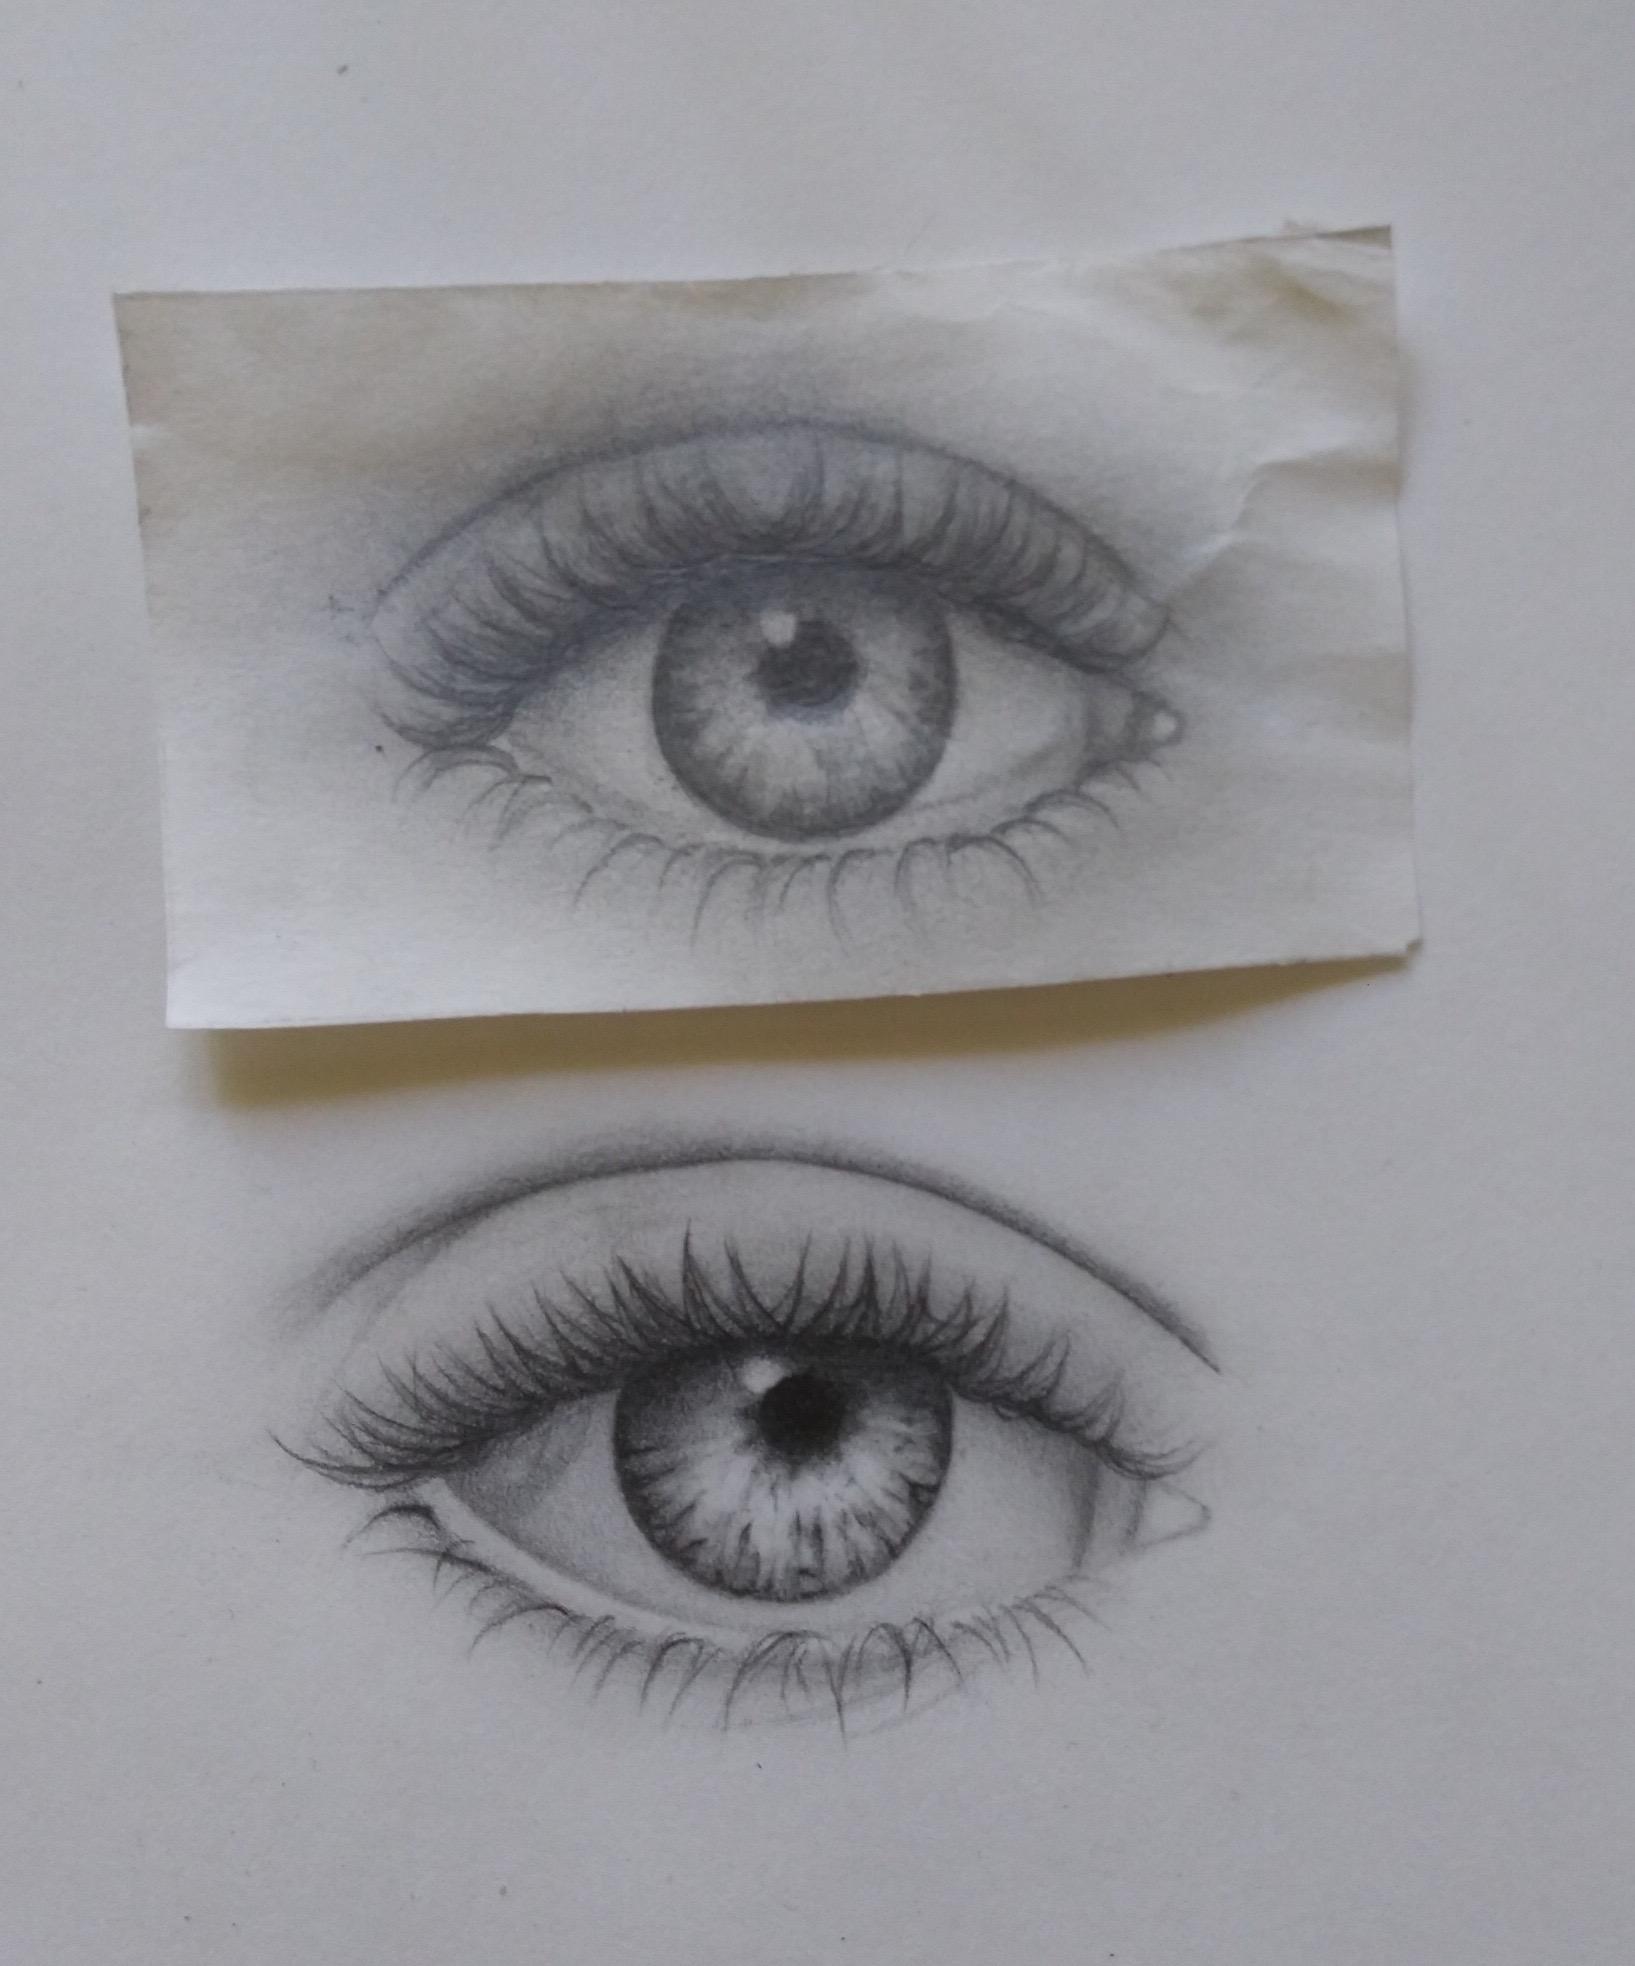 Pencil (top picture was drawn 1 prior), age 14